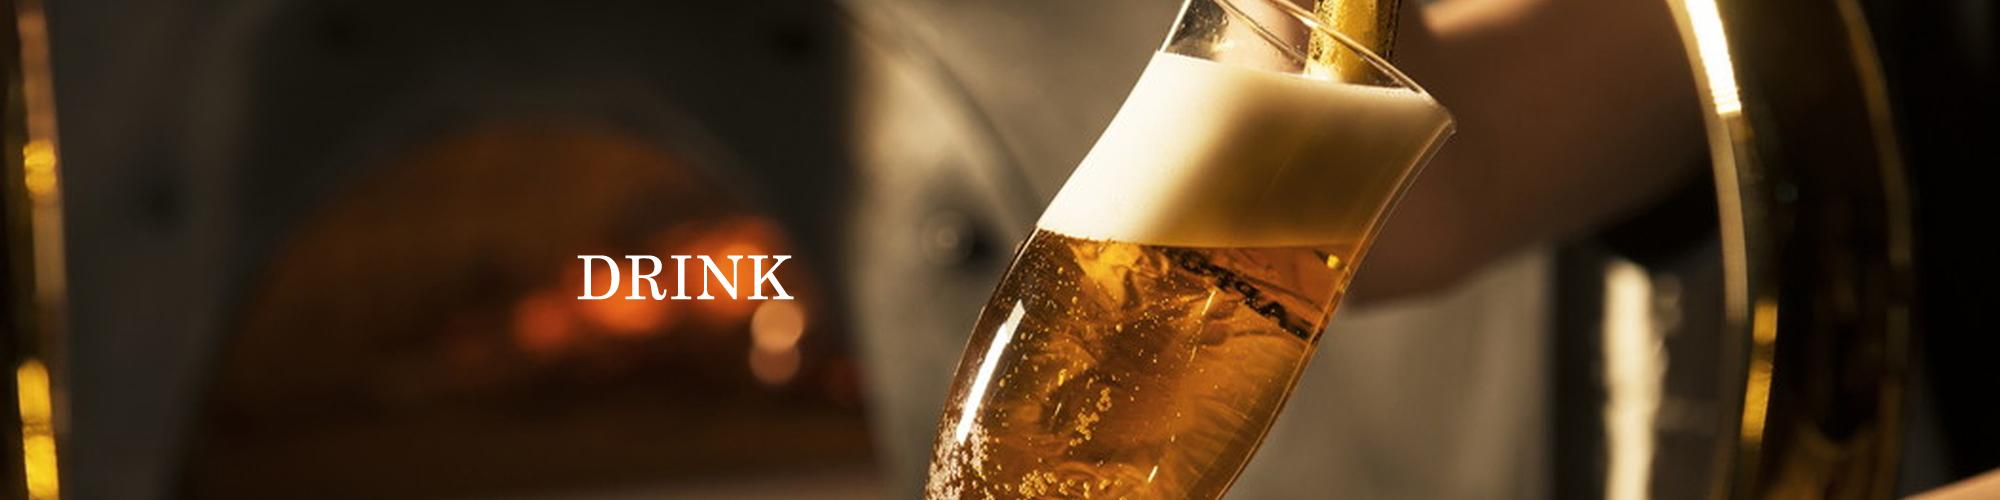 drink_main